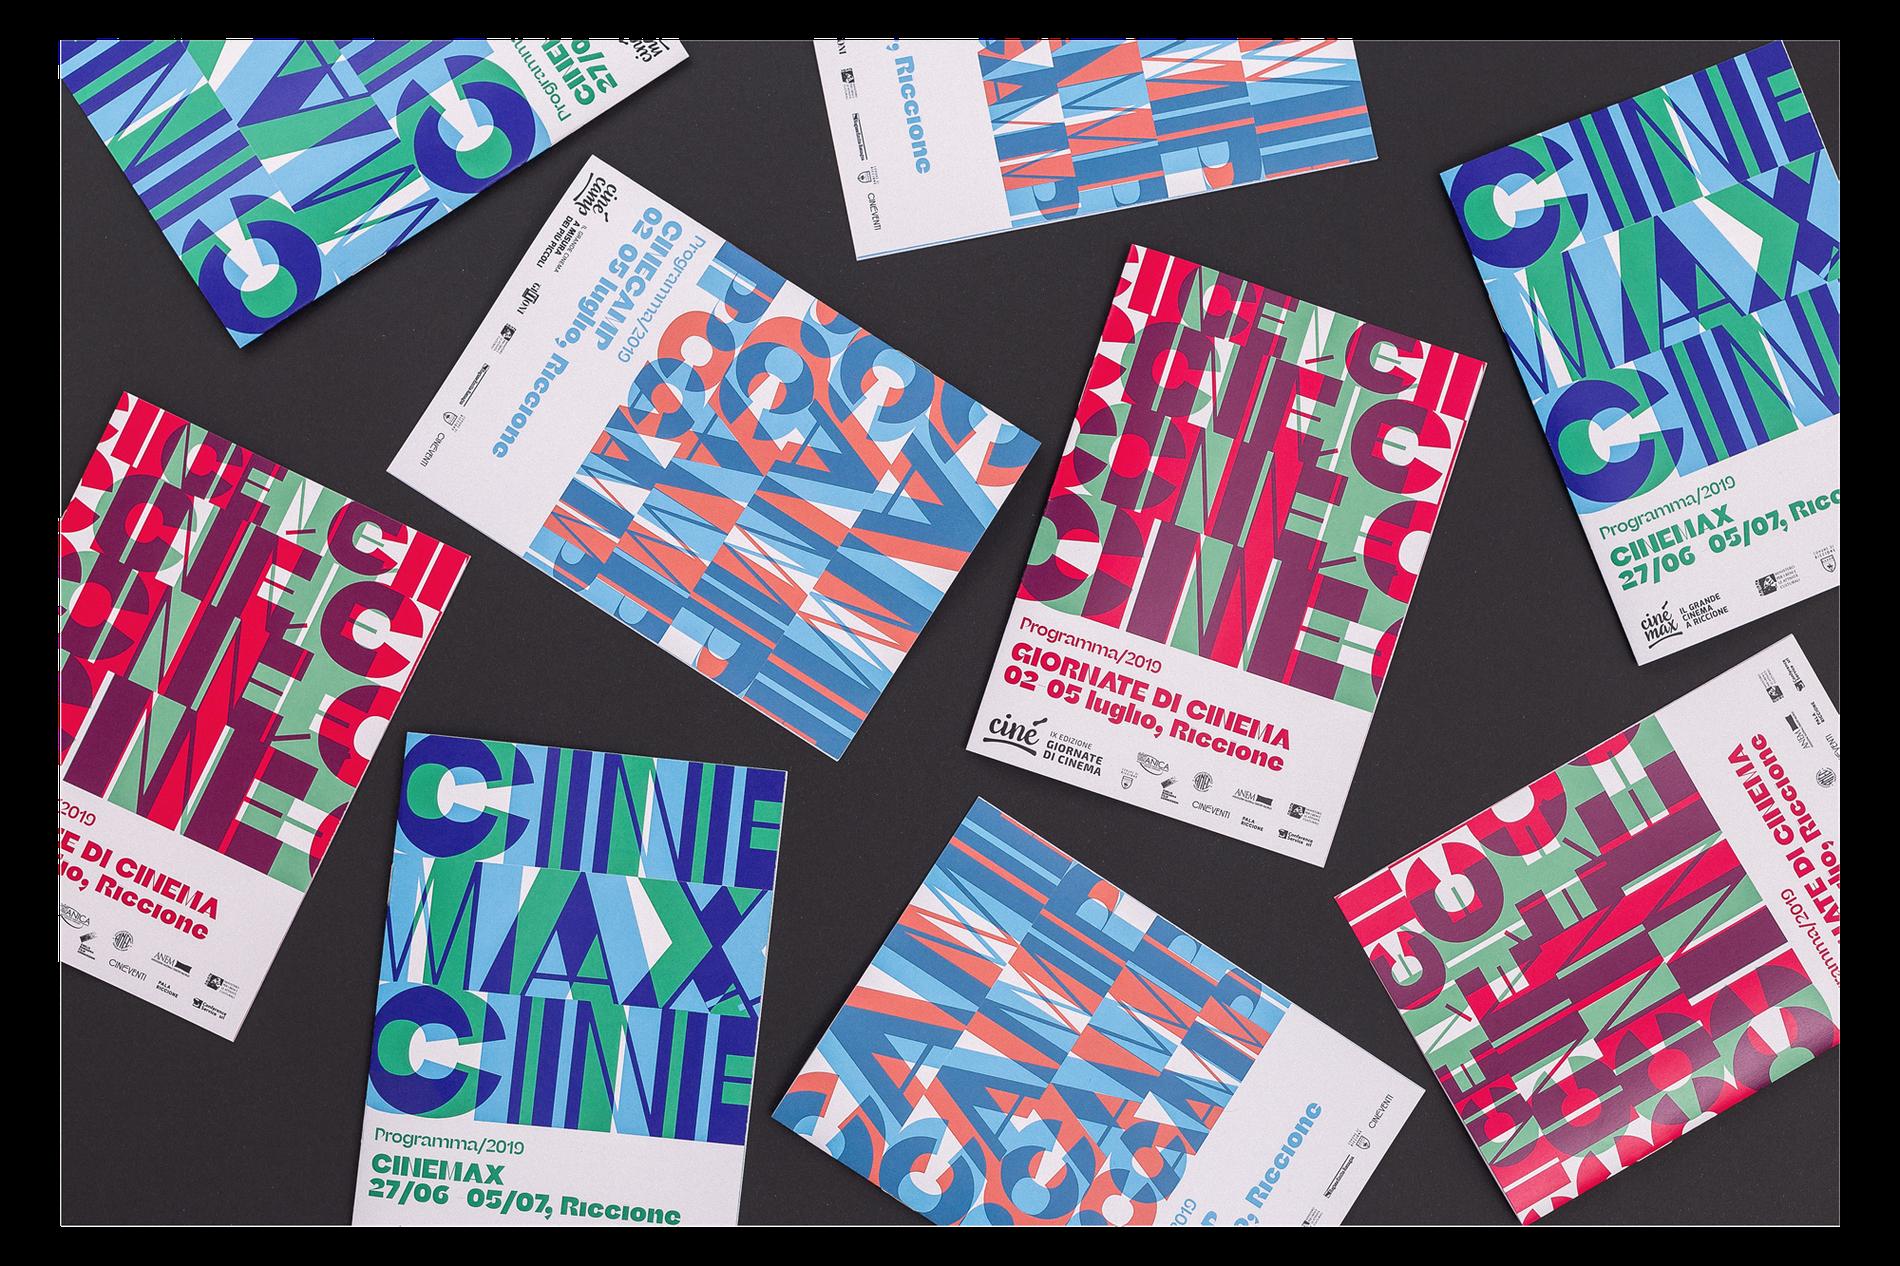 PaulaDelMas_Cine_cinema_festival_design_Program_2.jpg